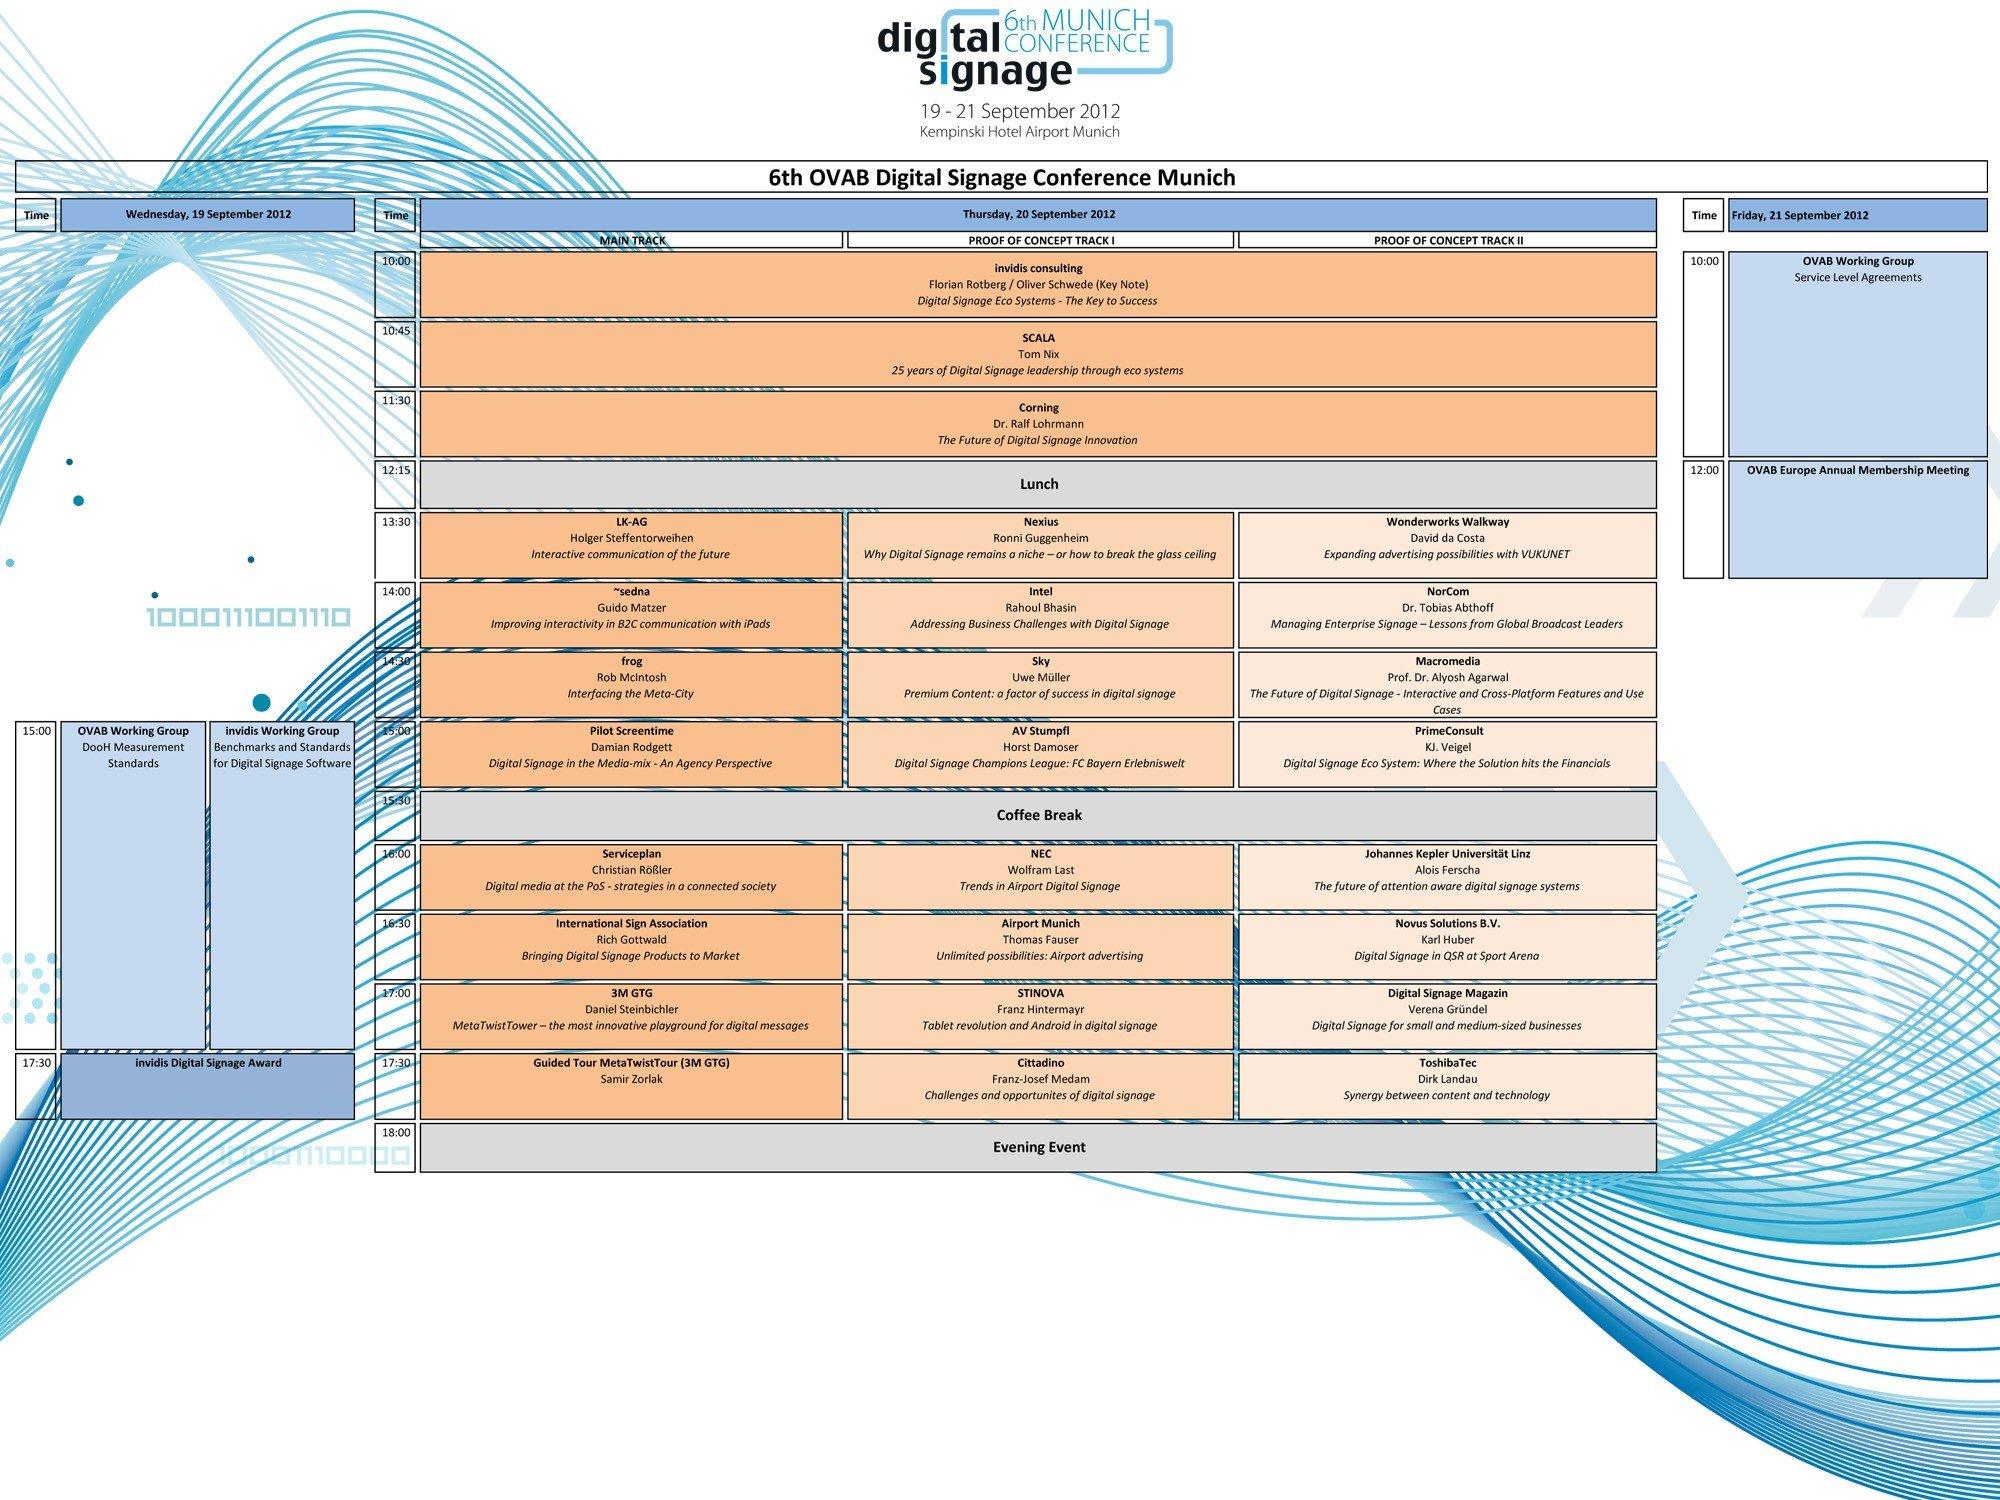 Digital Signage Conference Munich: Europas führende Digital-Signage-Strategiekonferenz